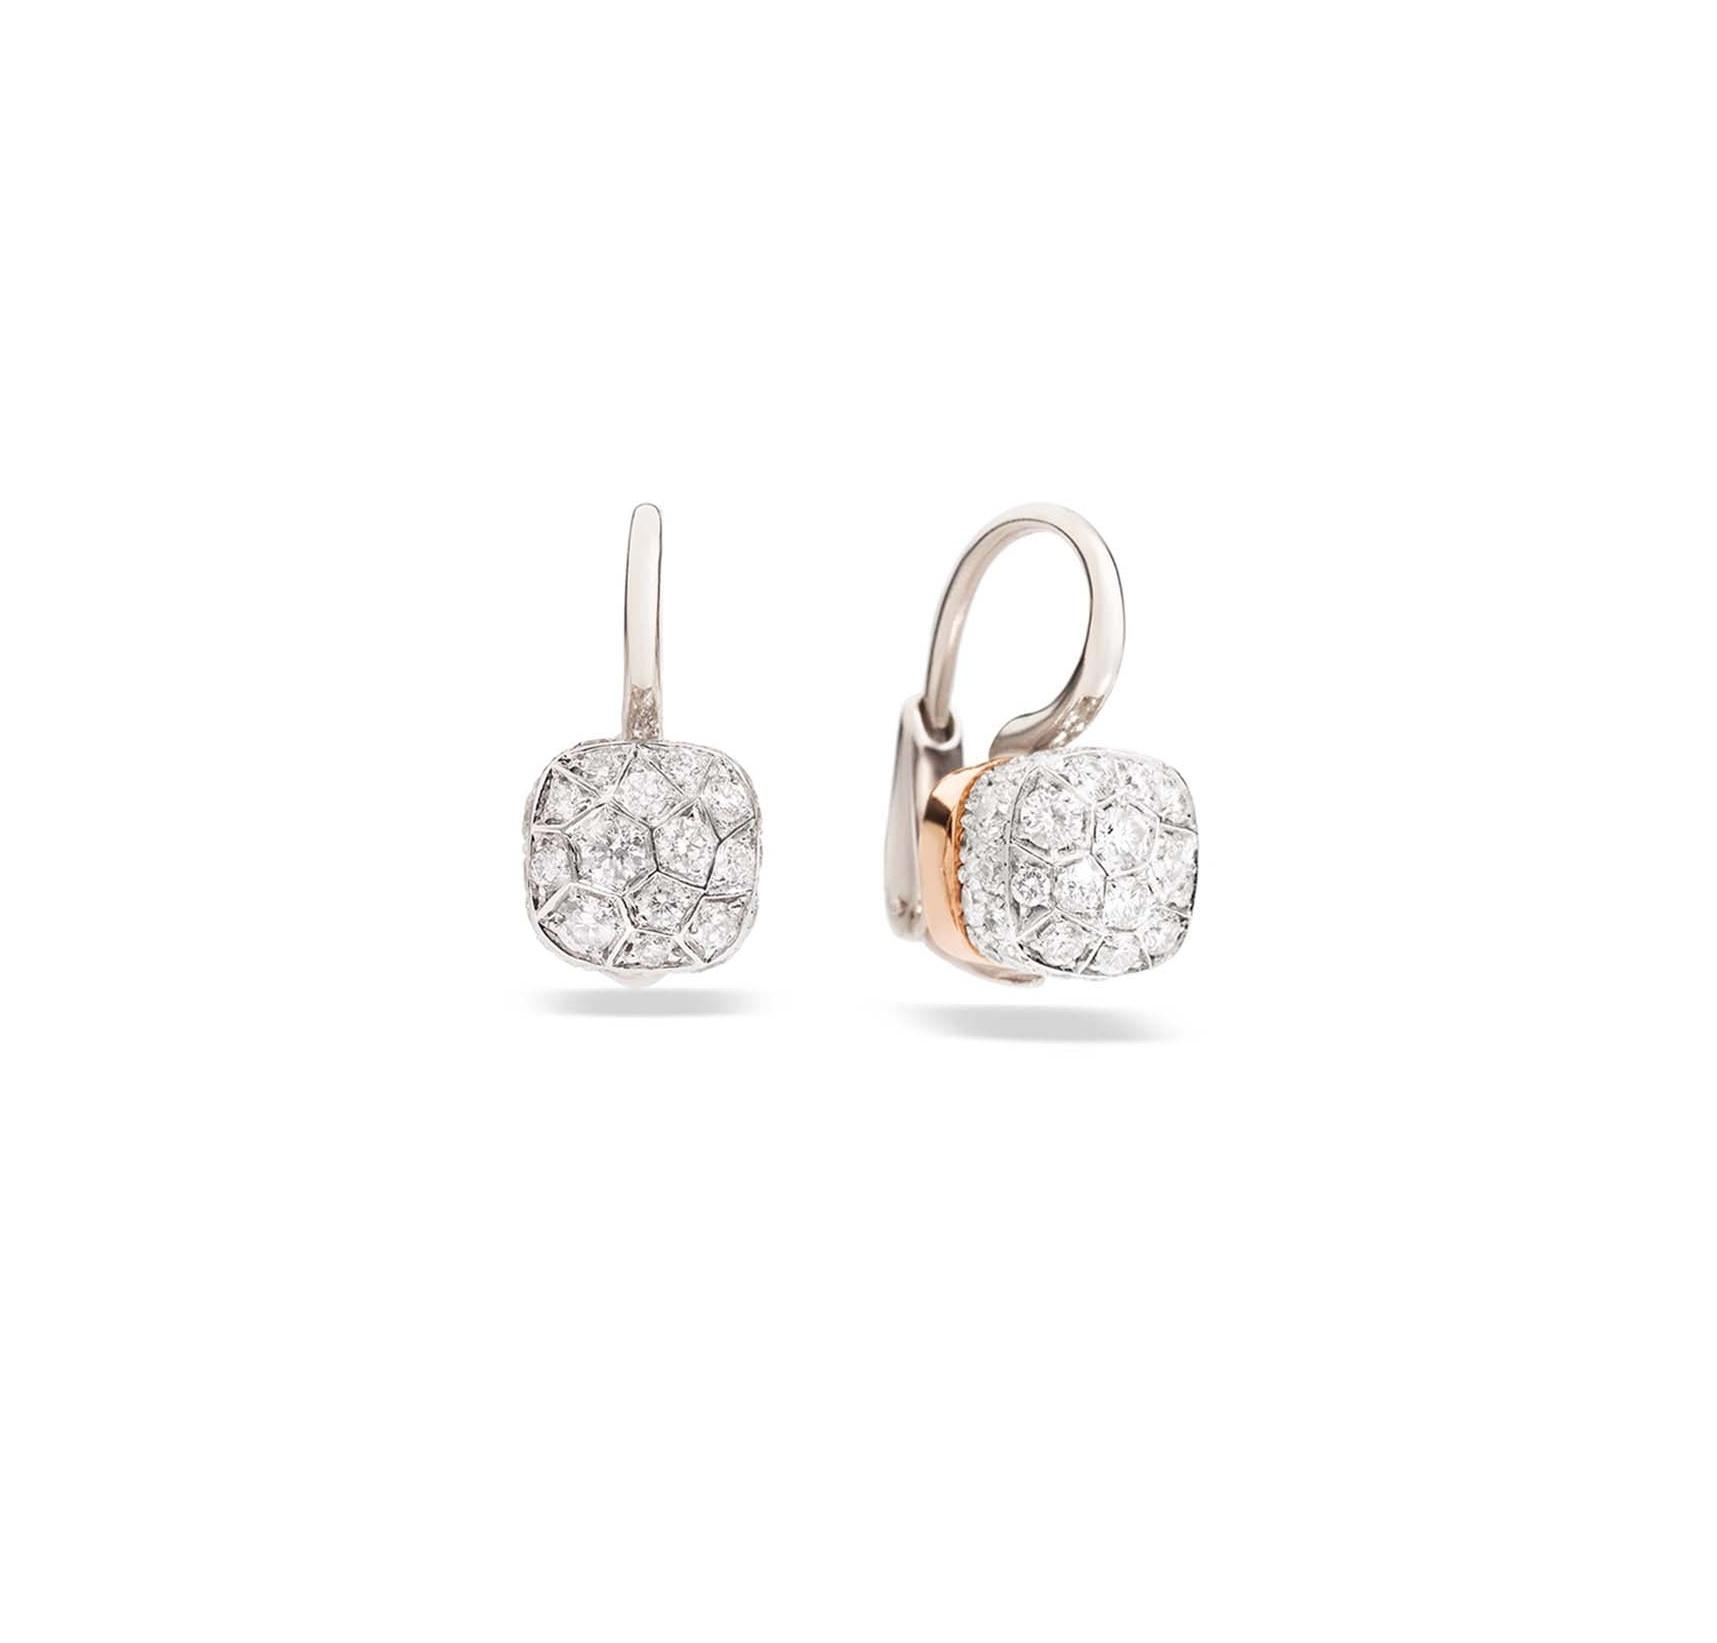 Pomellato Nudo Petit oorhangers 18kt. roségoud met diamant